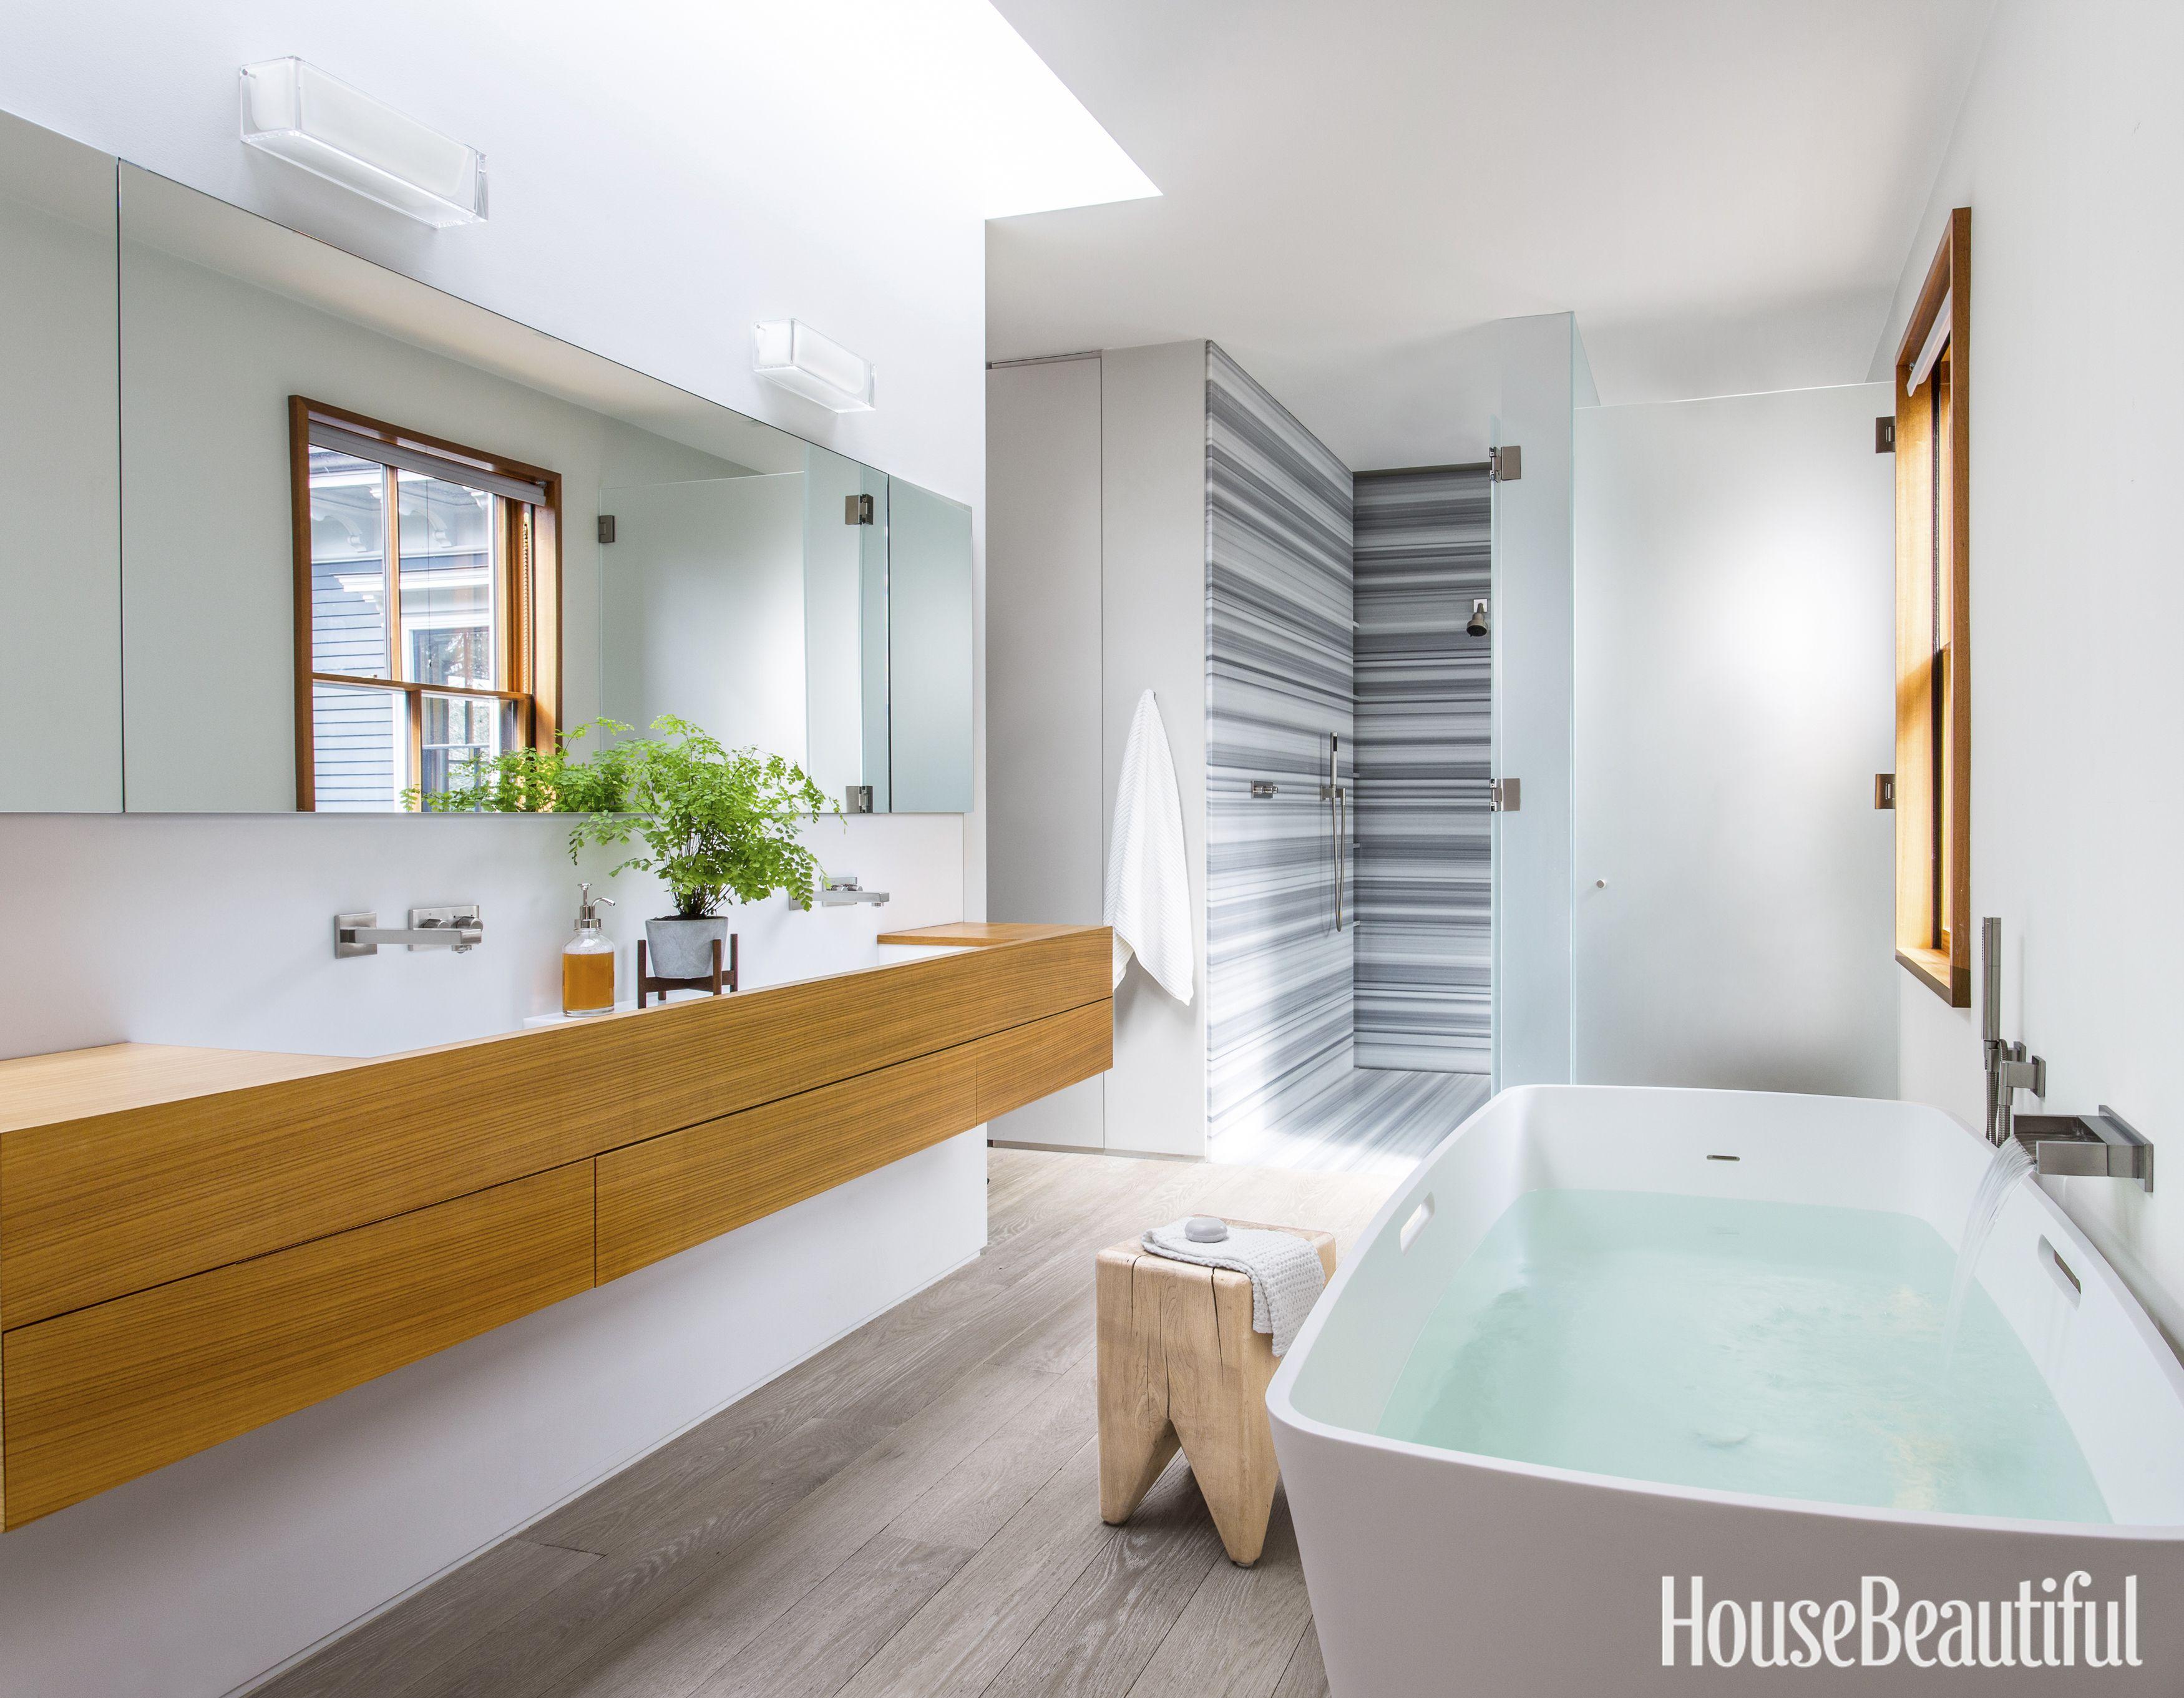 Beautiful Bathrooms Designs - storiestrending.com on Beautiful Bathroom Ideas  id=75336